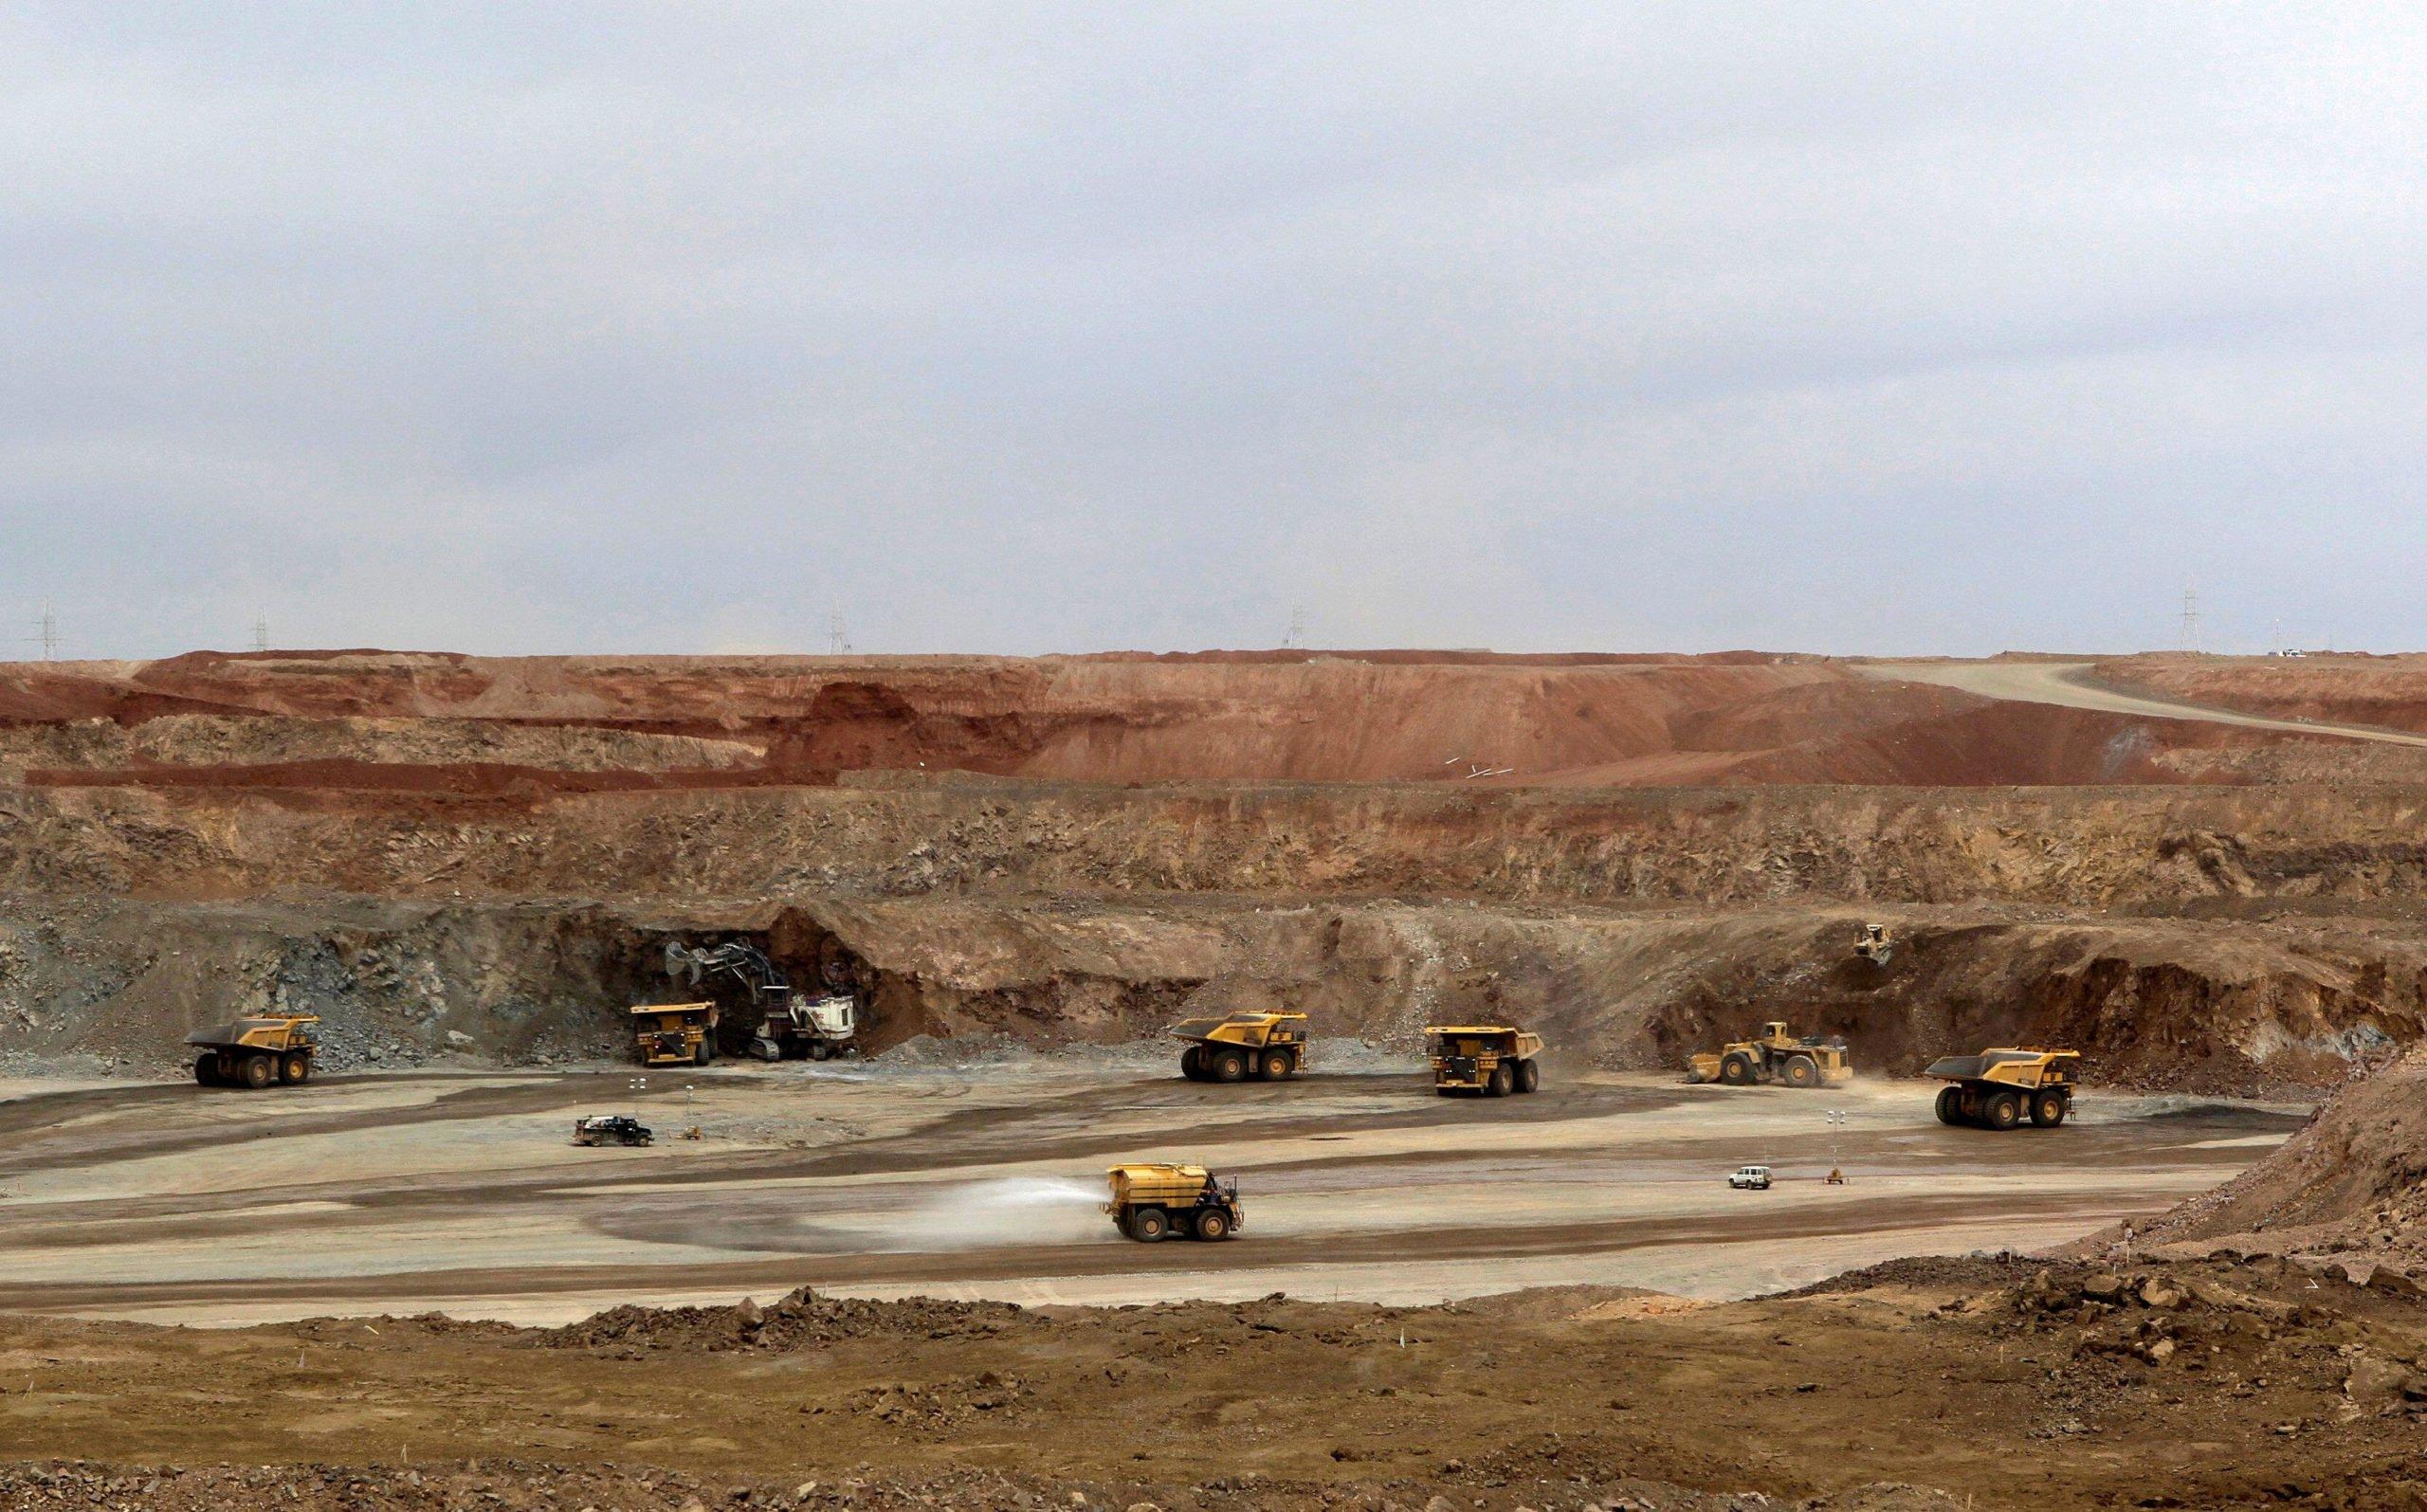 Oyu Tolgoi, Mongolia, REUTERS/David Stanway/File Photo